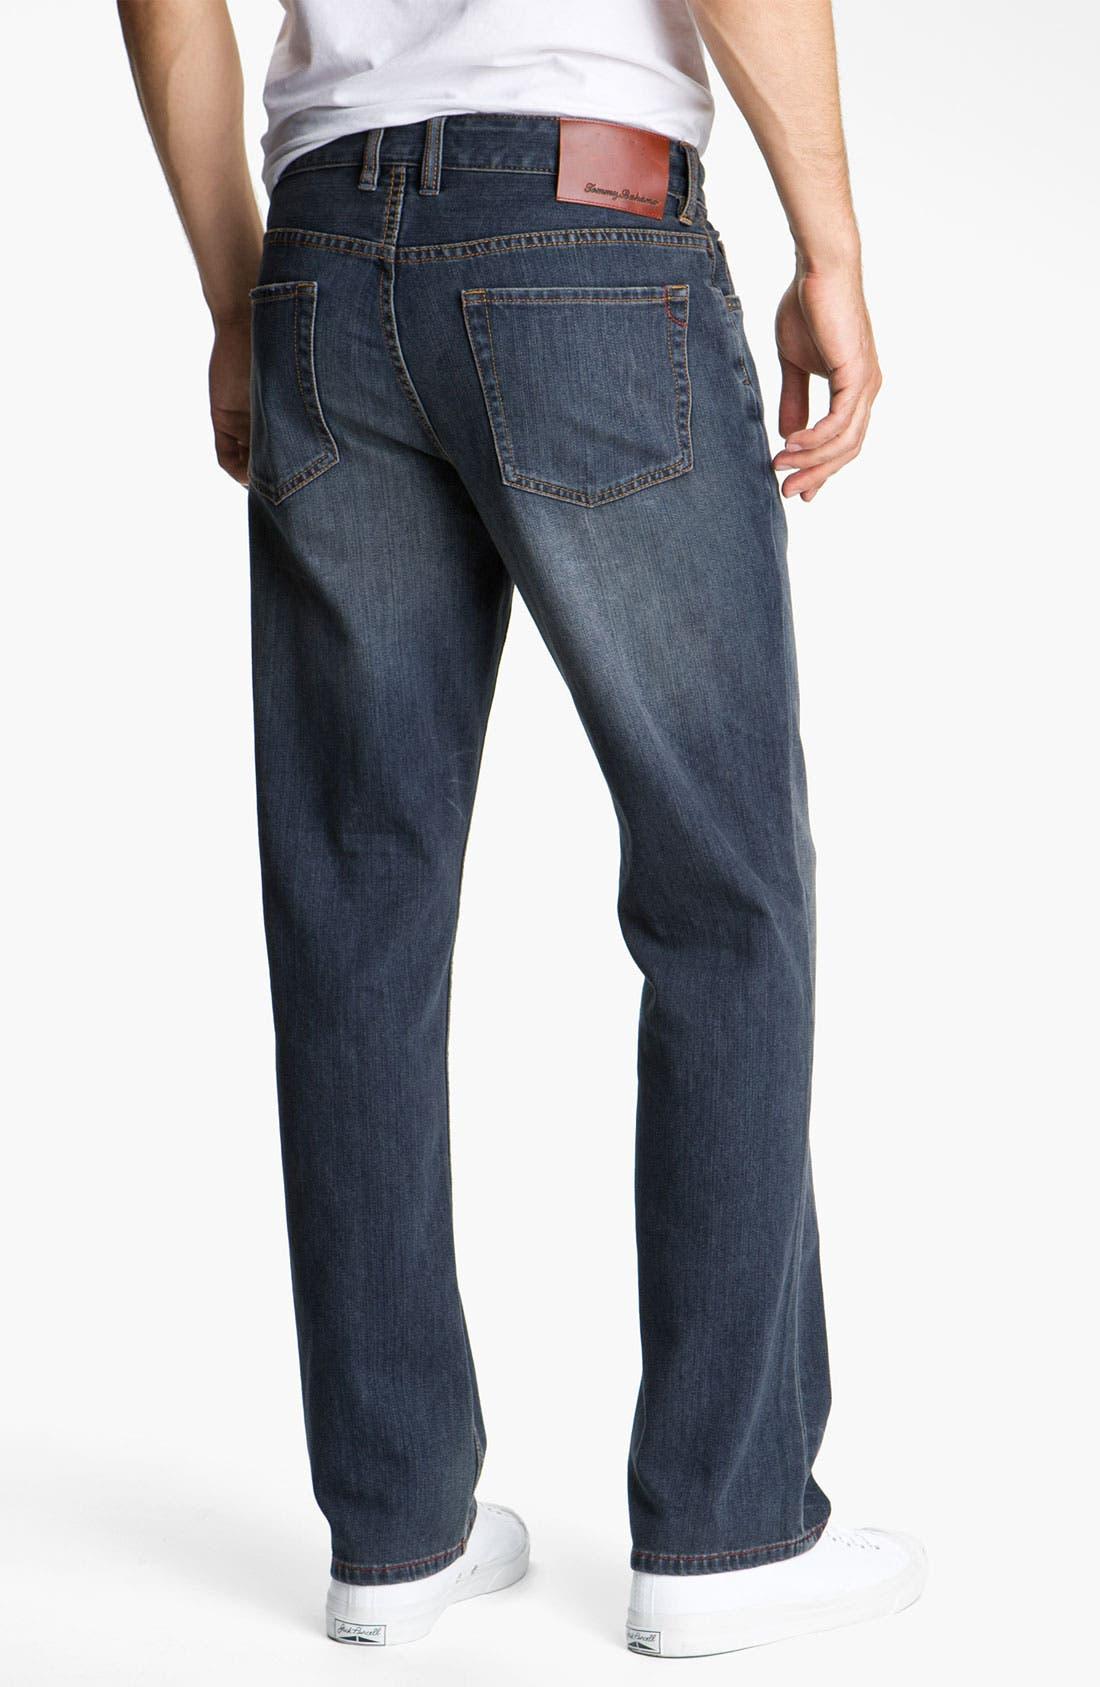 Main Image - Tommy Bahama Denim 'Original Cooper' Jeans (Dark Storm)